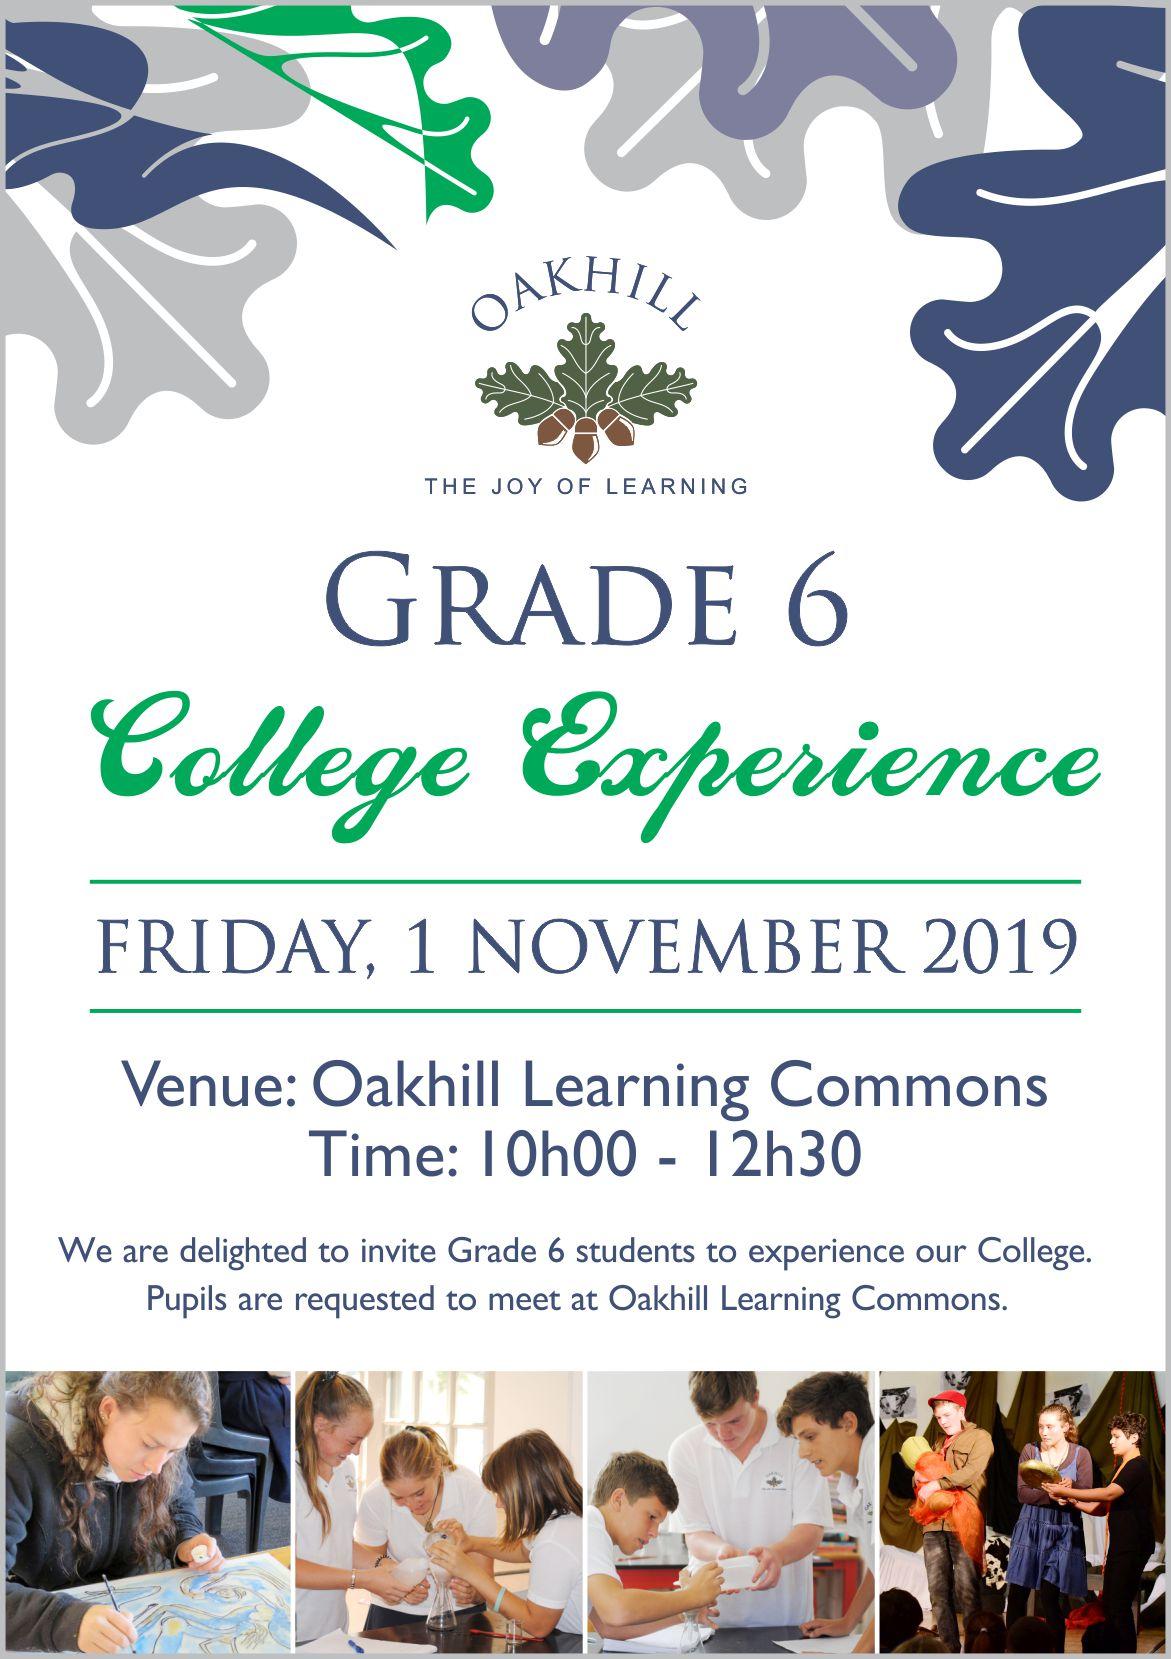 Grade 6 College Experience 2019